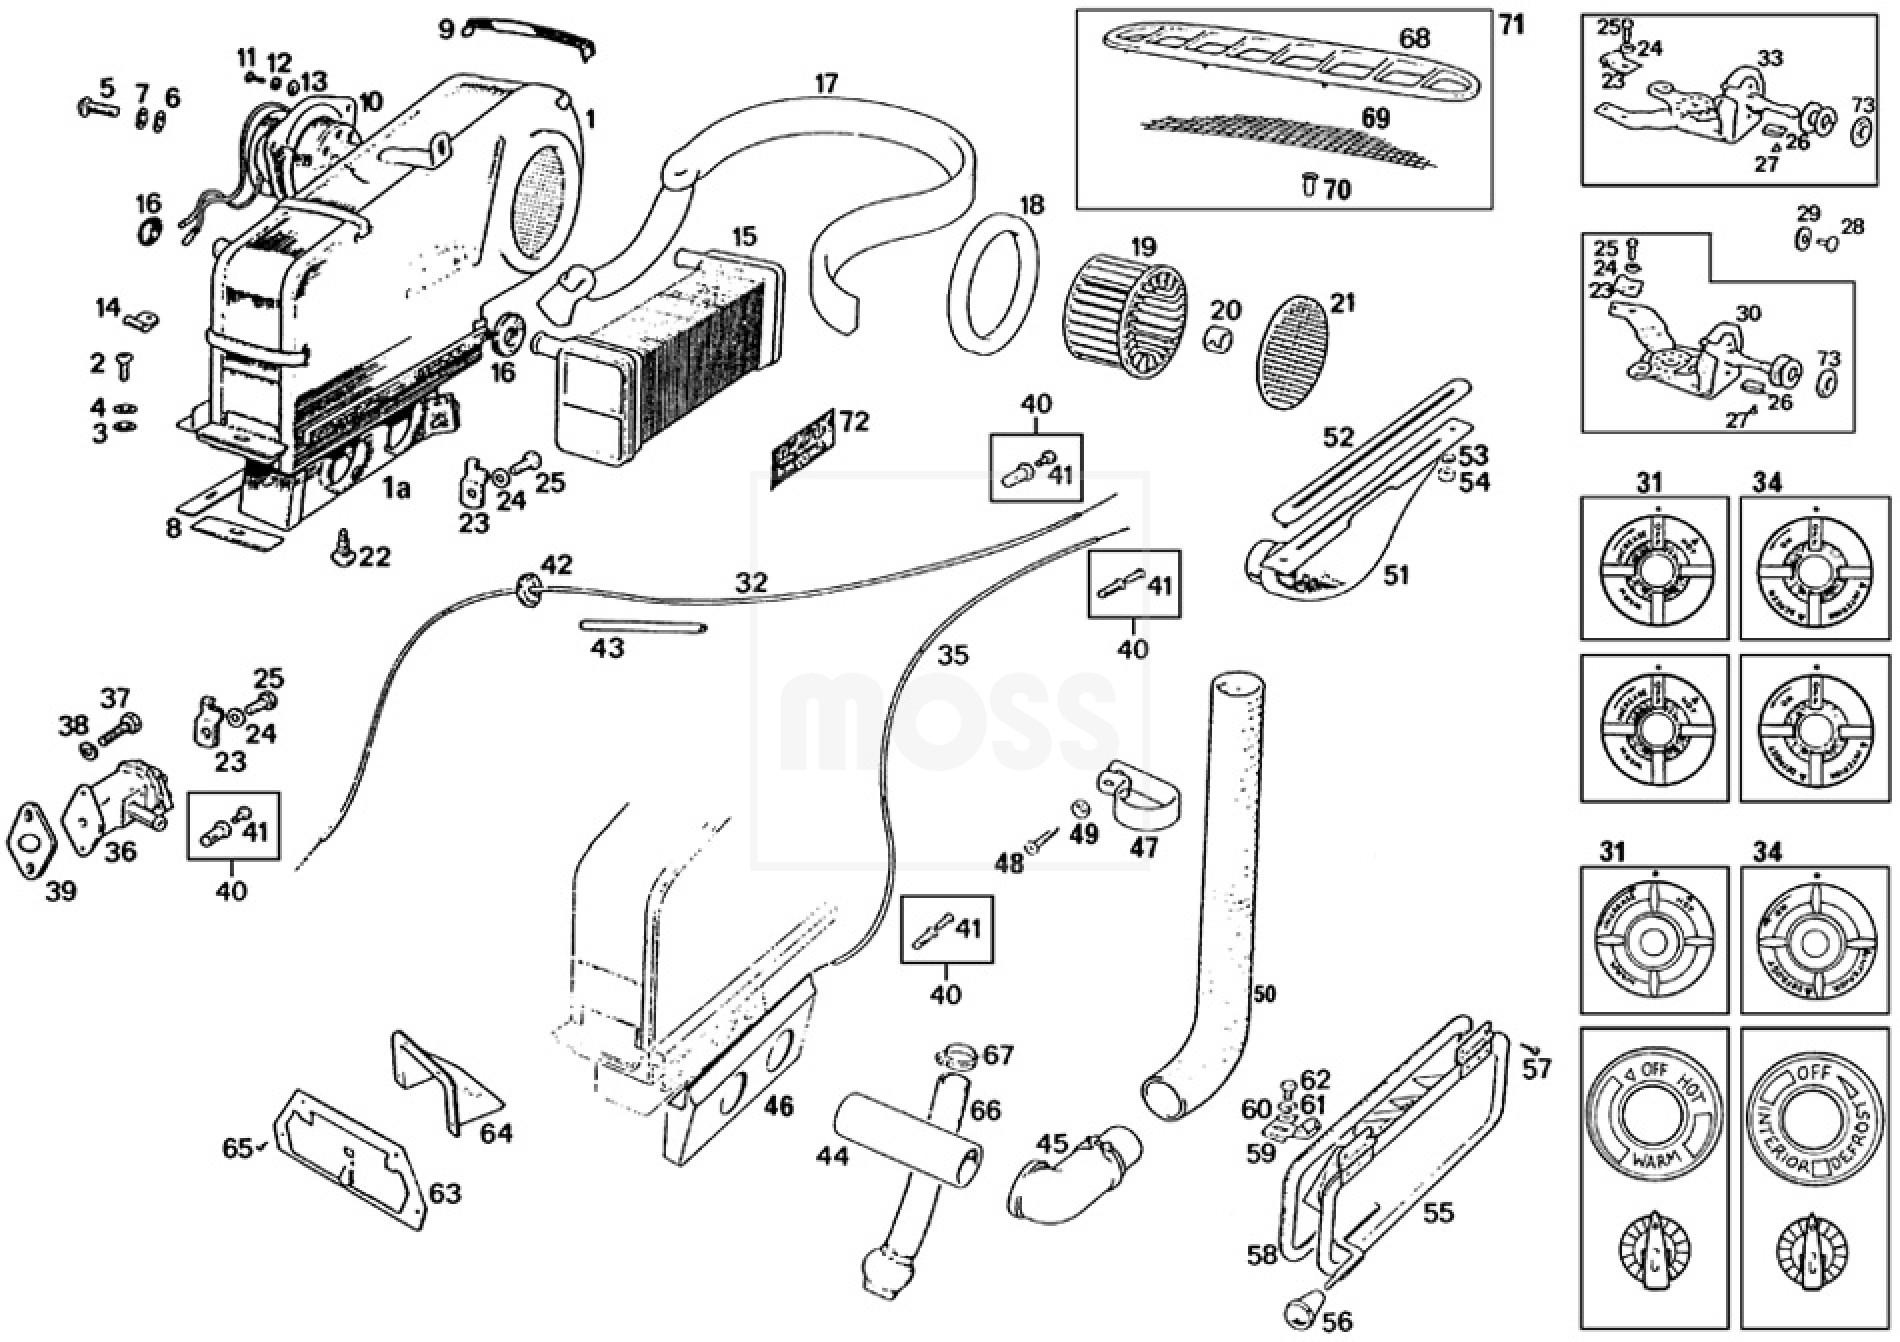 heater unit  u0026 demister system